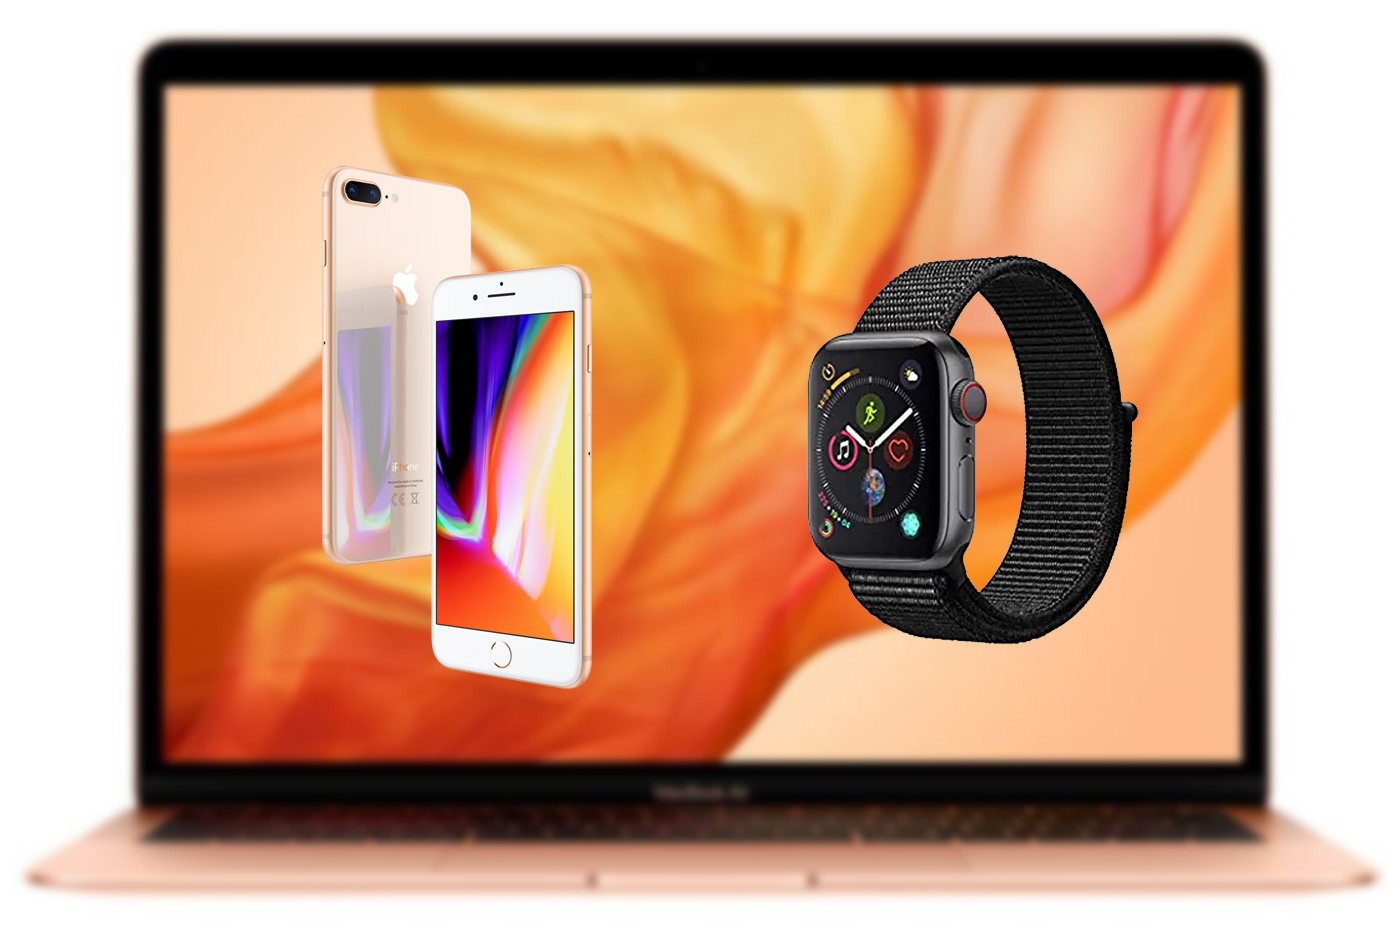 Prime Day Apple : iPhone, iPad Pro, Macbook Pro… les offres qui terminent ce soir 🔥